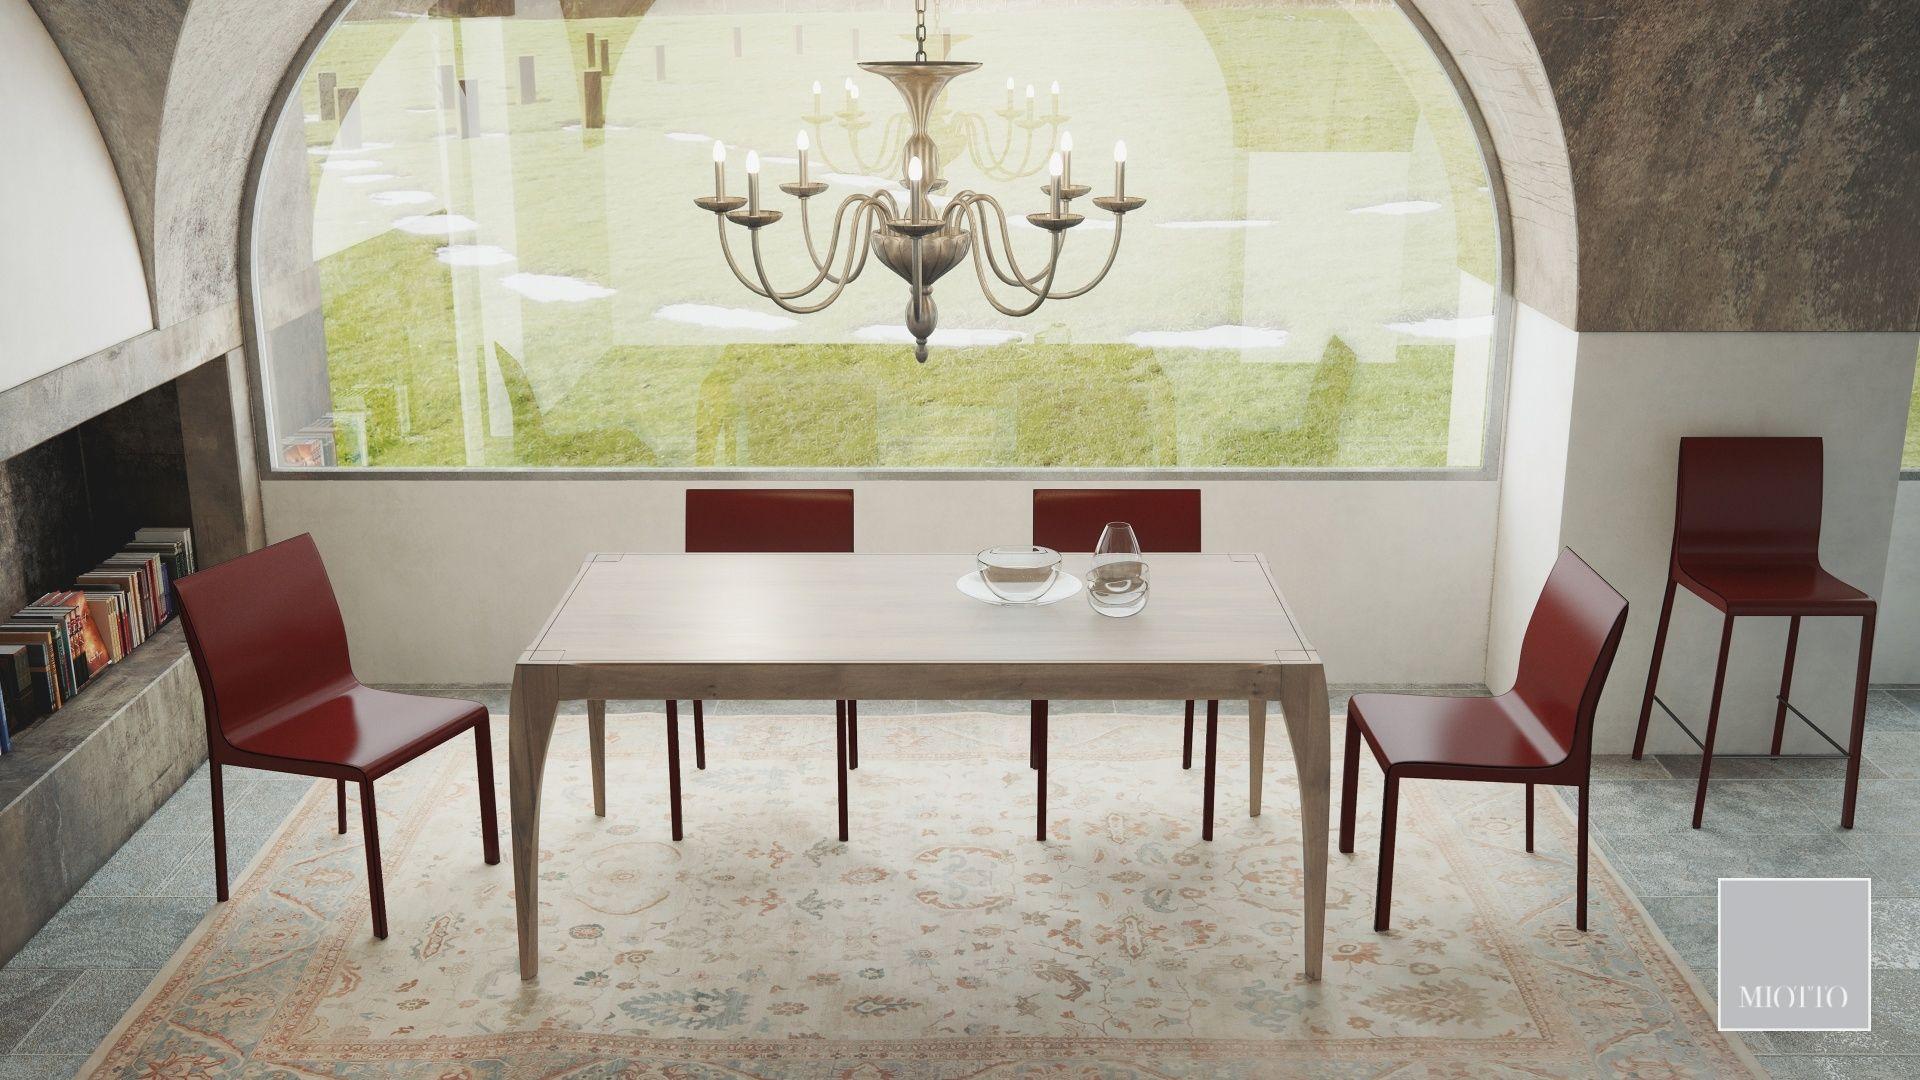 miotto_Breneta dining table walnut, ardini chair stool burgundy